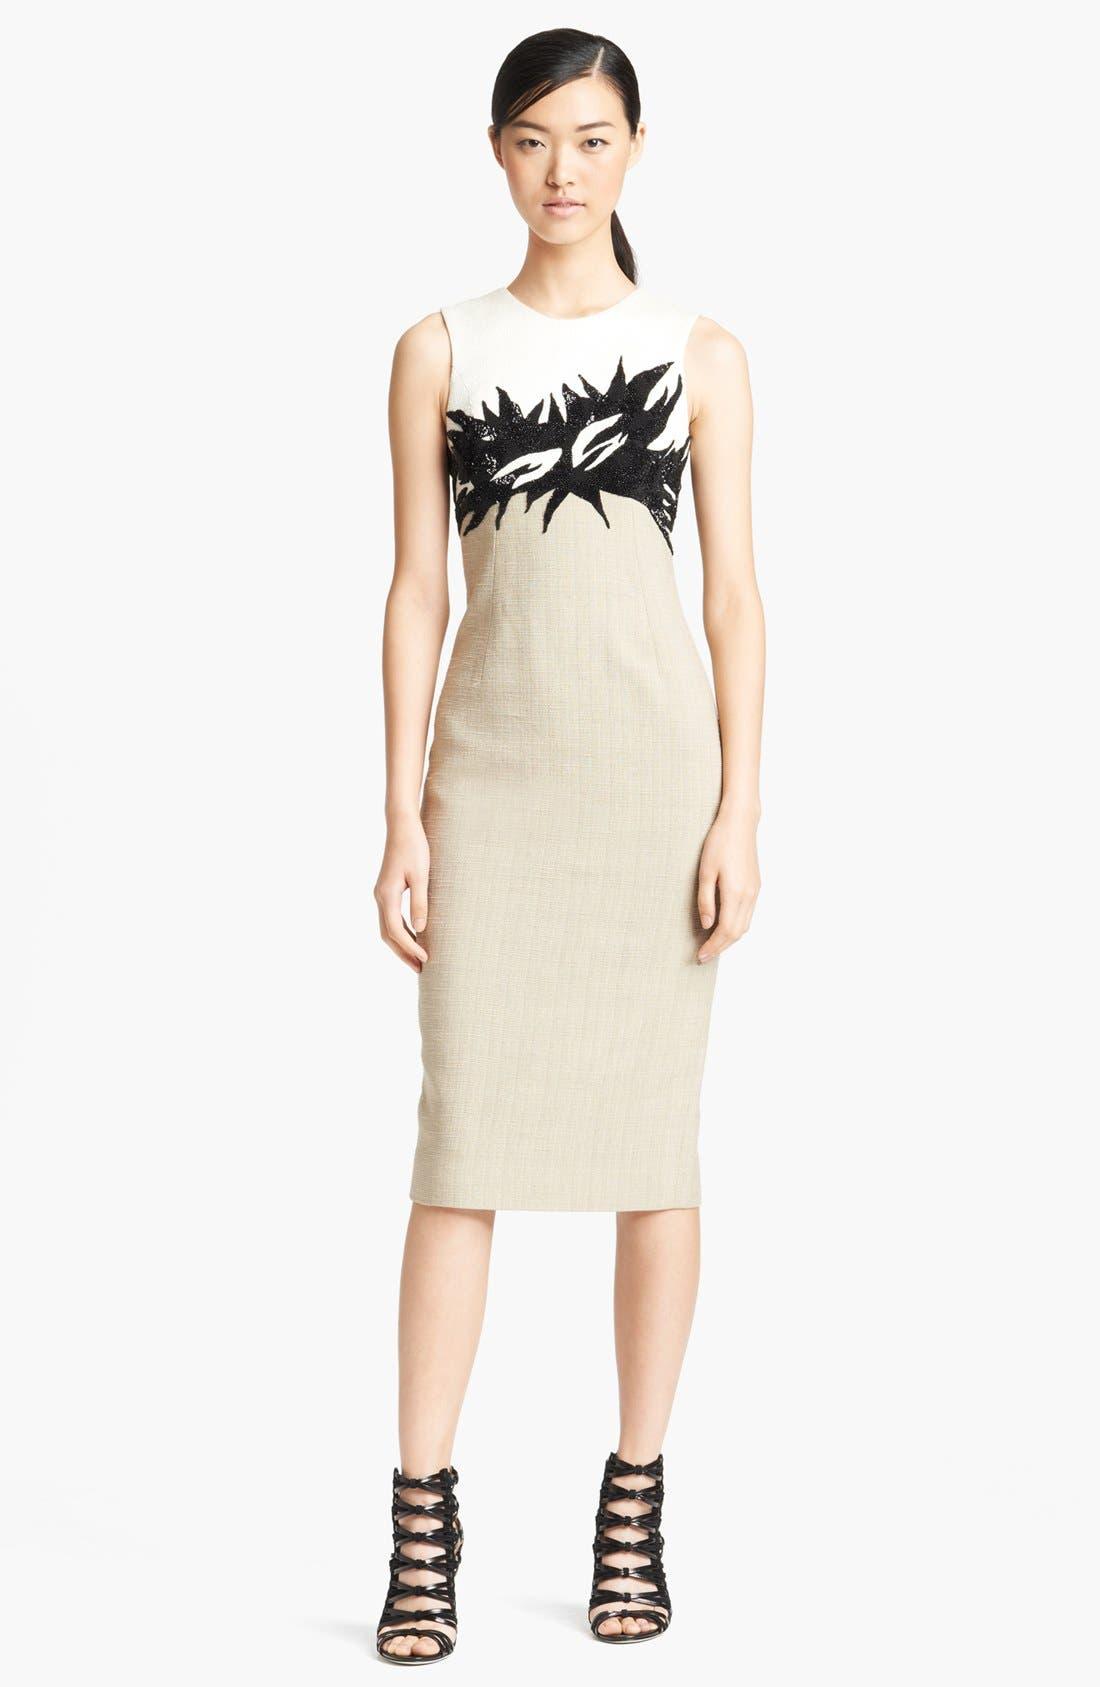 Alternate Image 1 Selected - Jason Wu Botanical Appliqué Tweed Sheath Dress